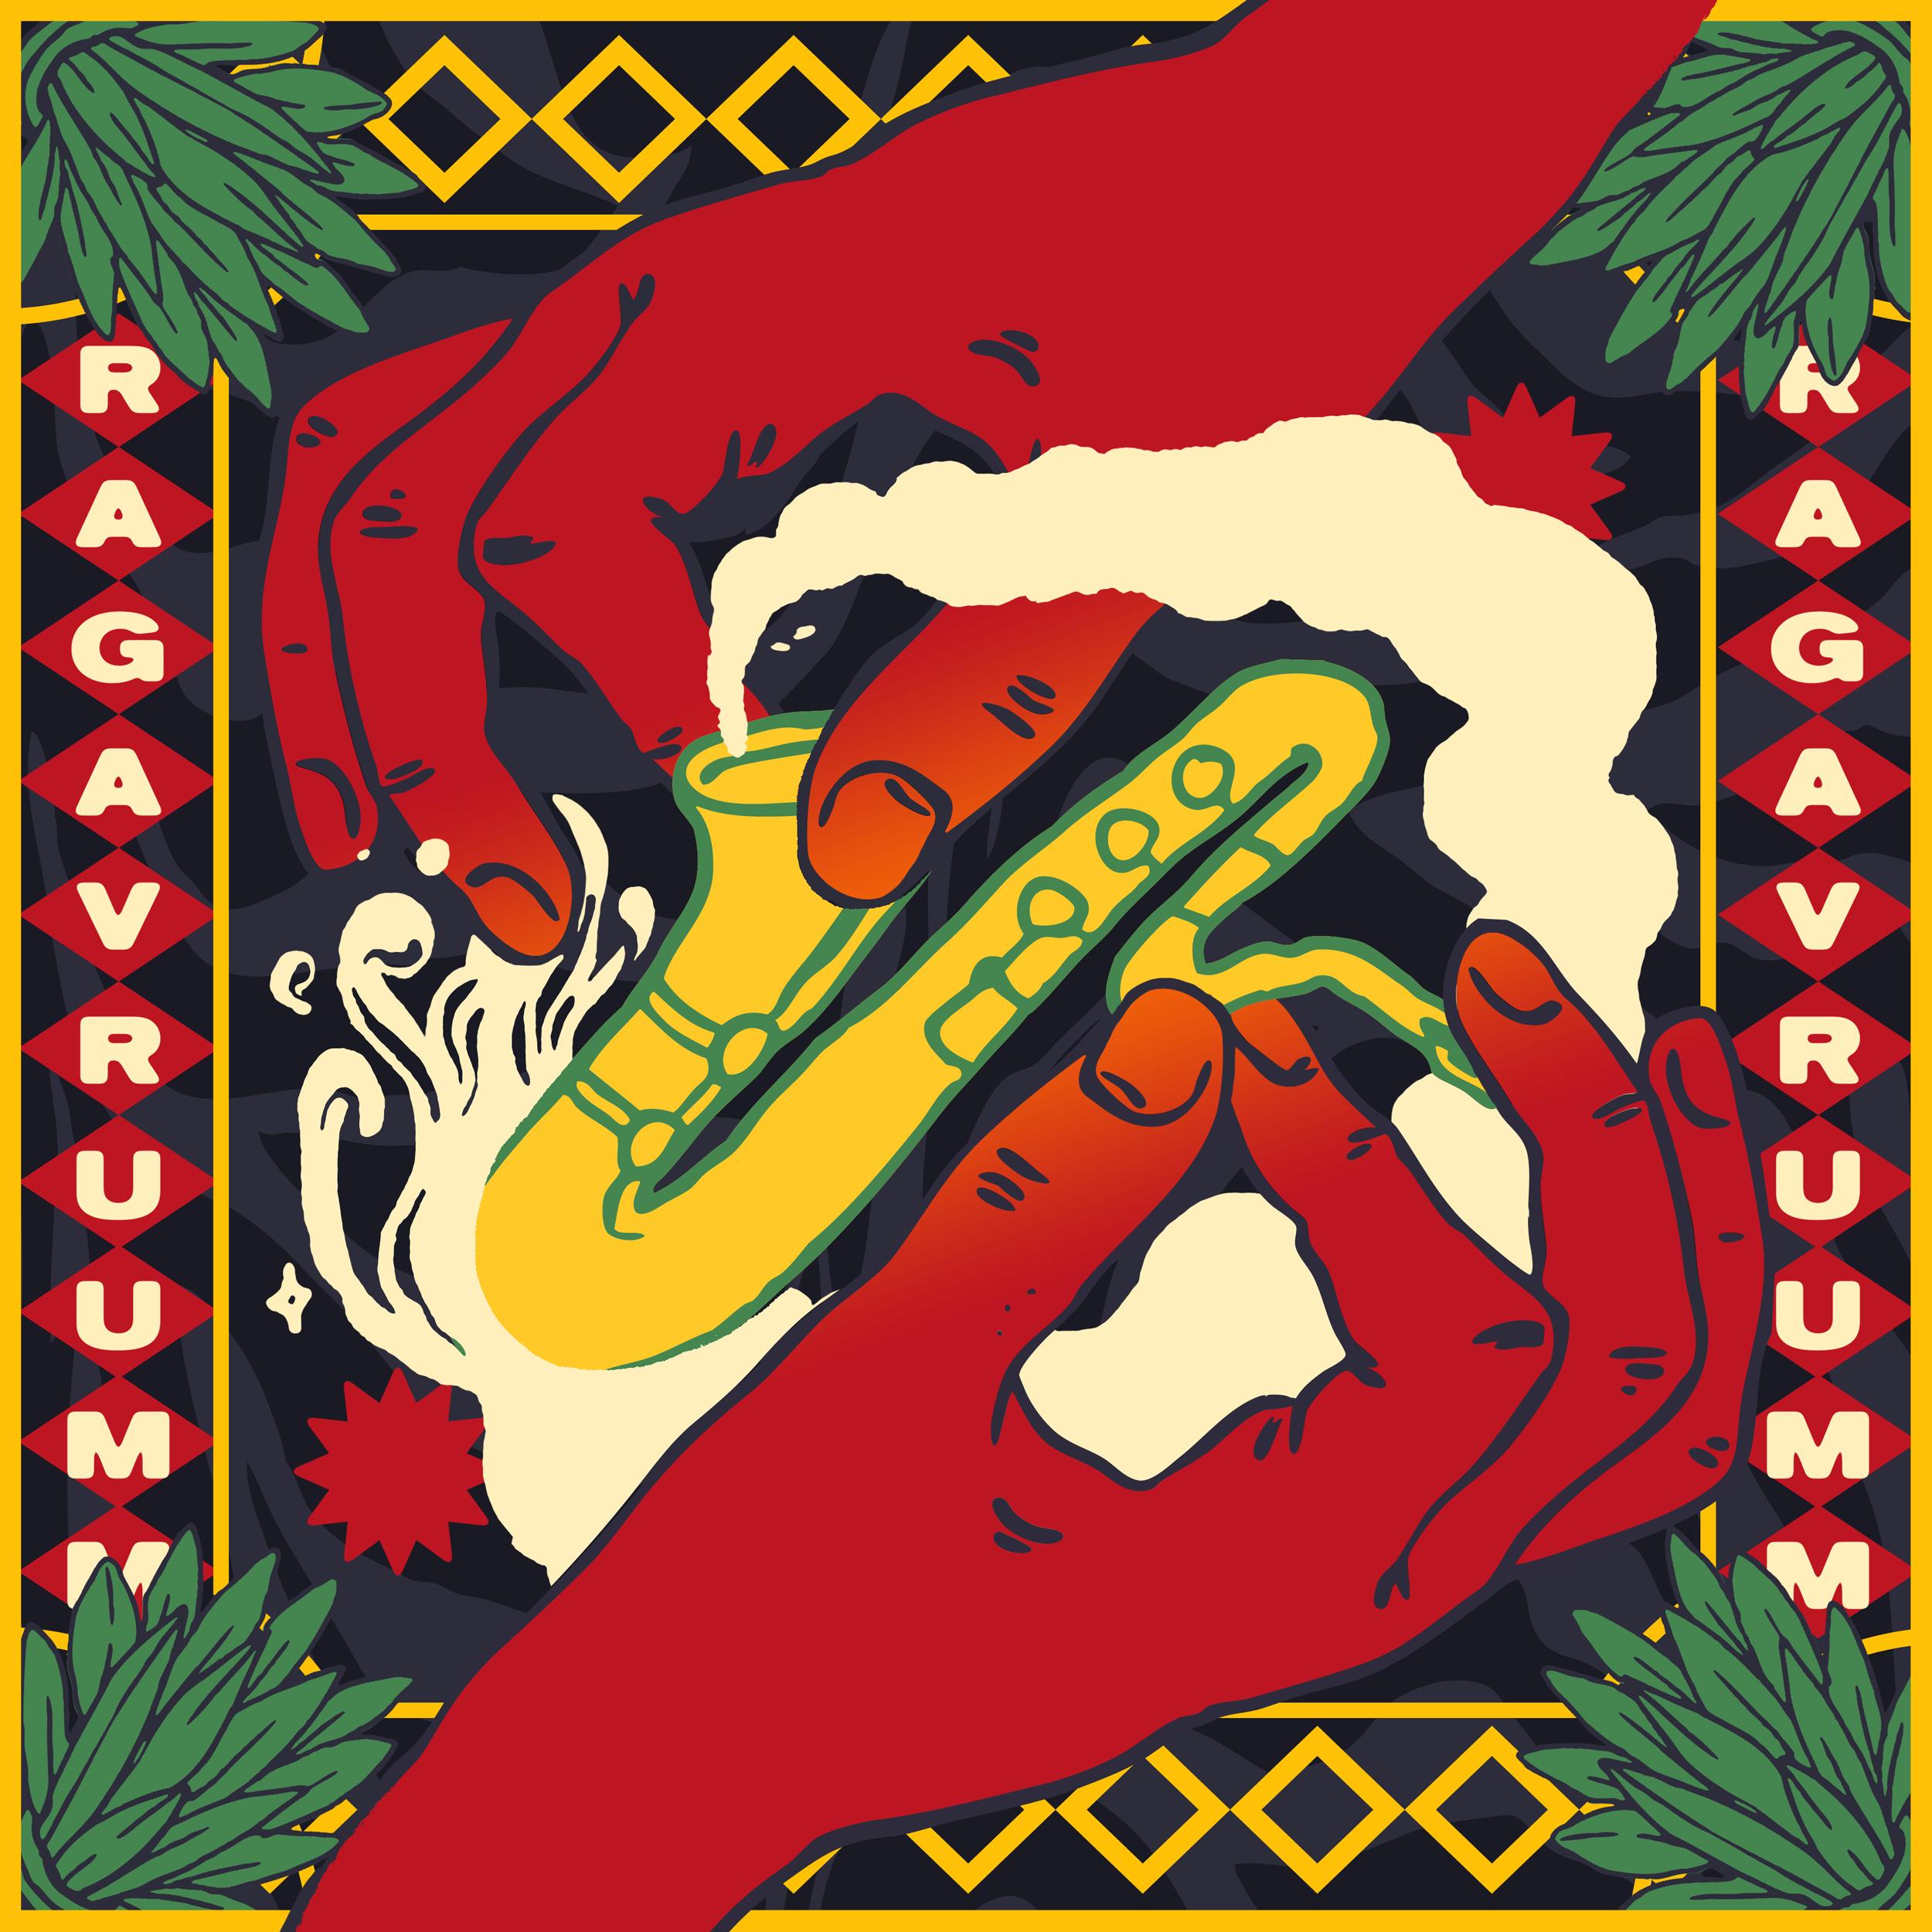 Ragavruumm (1)